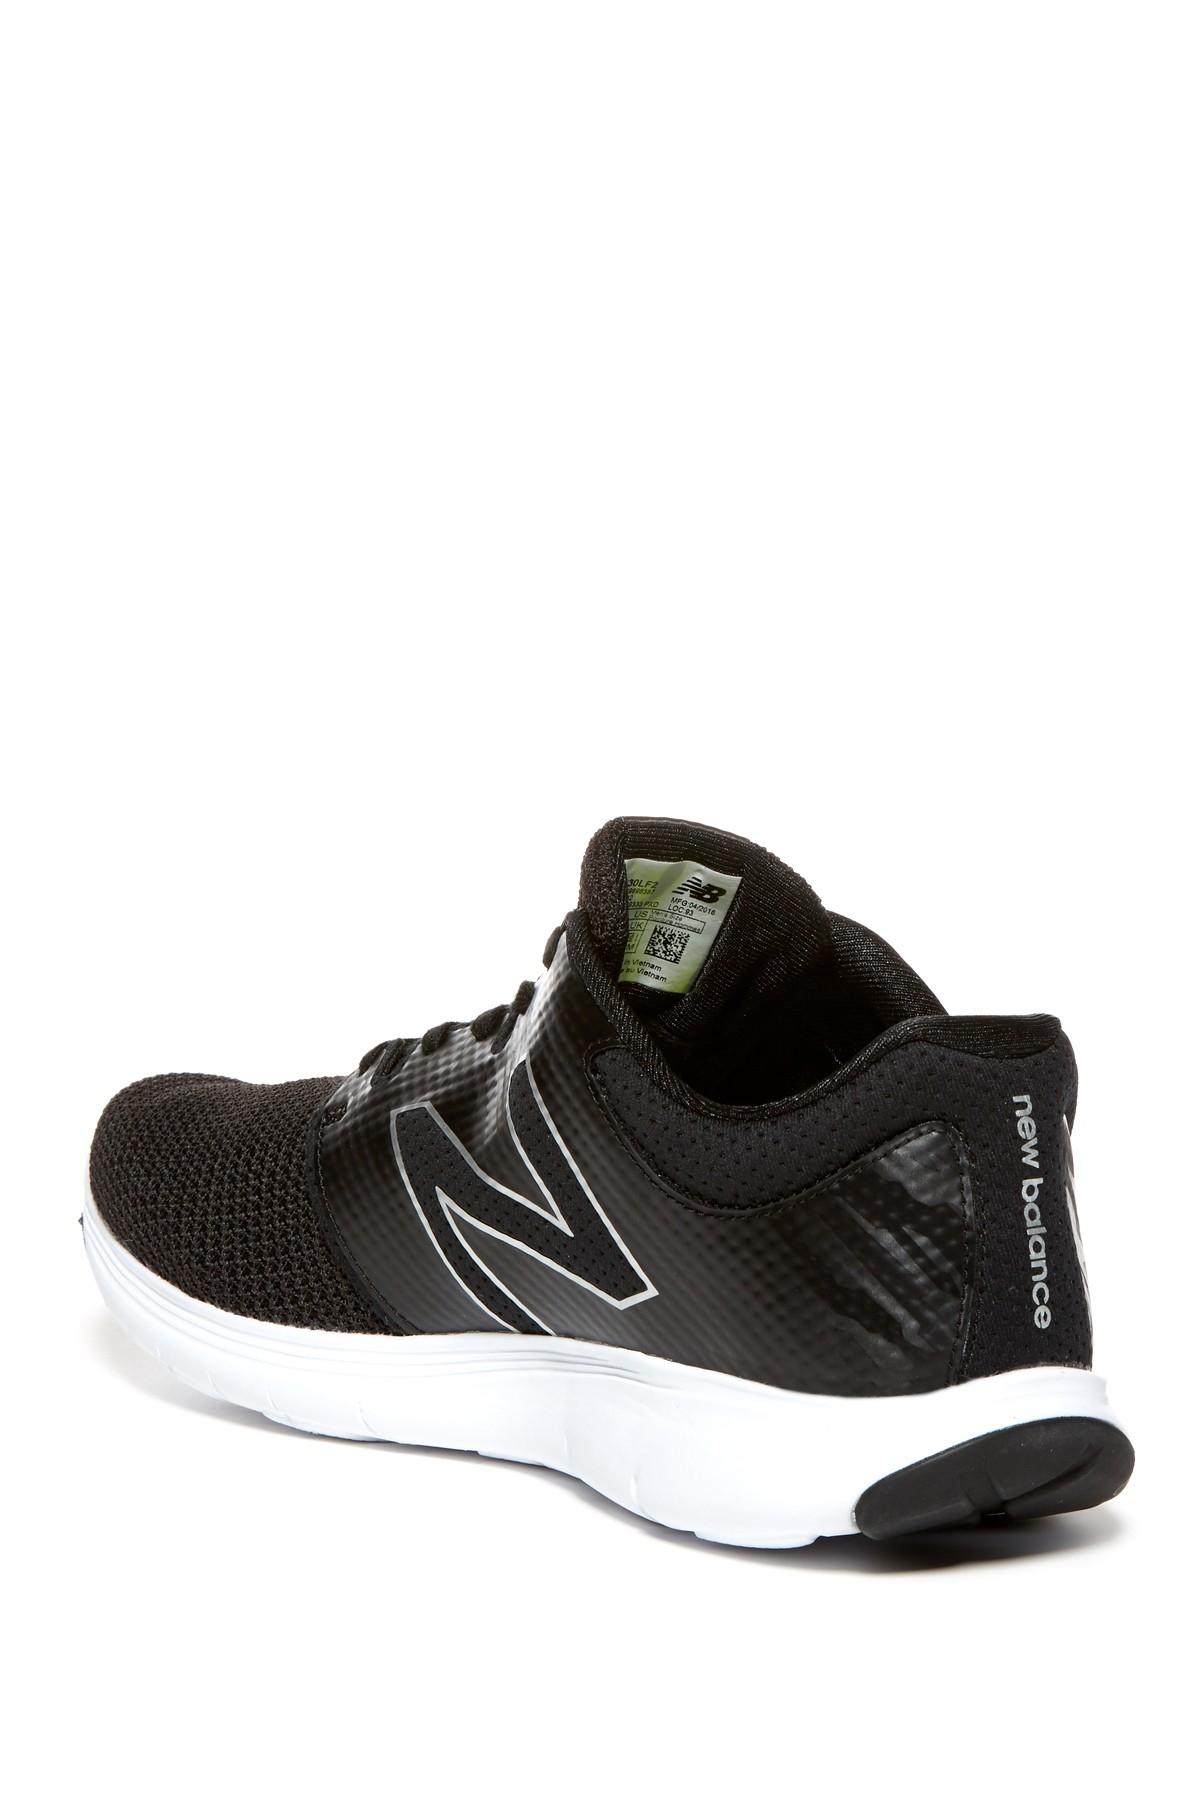 new balance balance flx ride 530 v2 running shoe